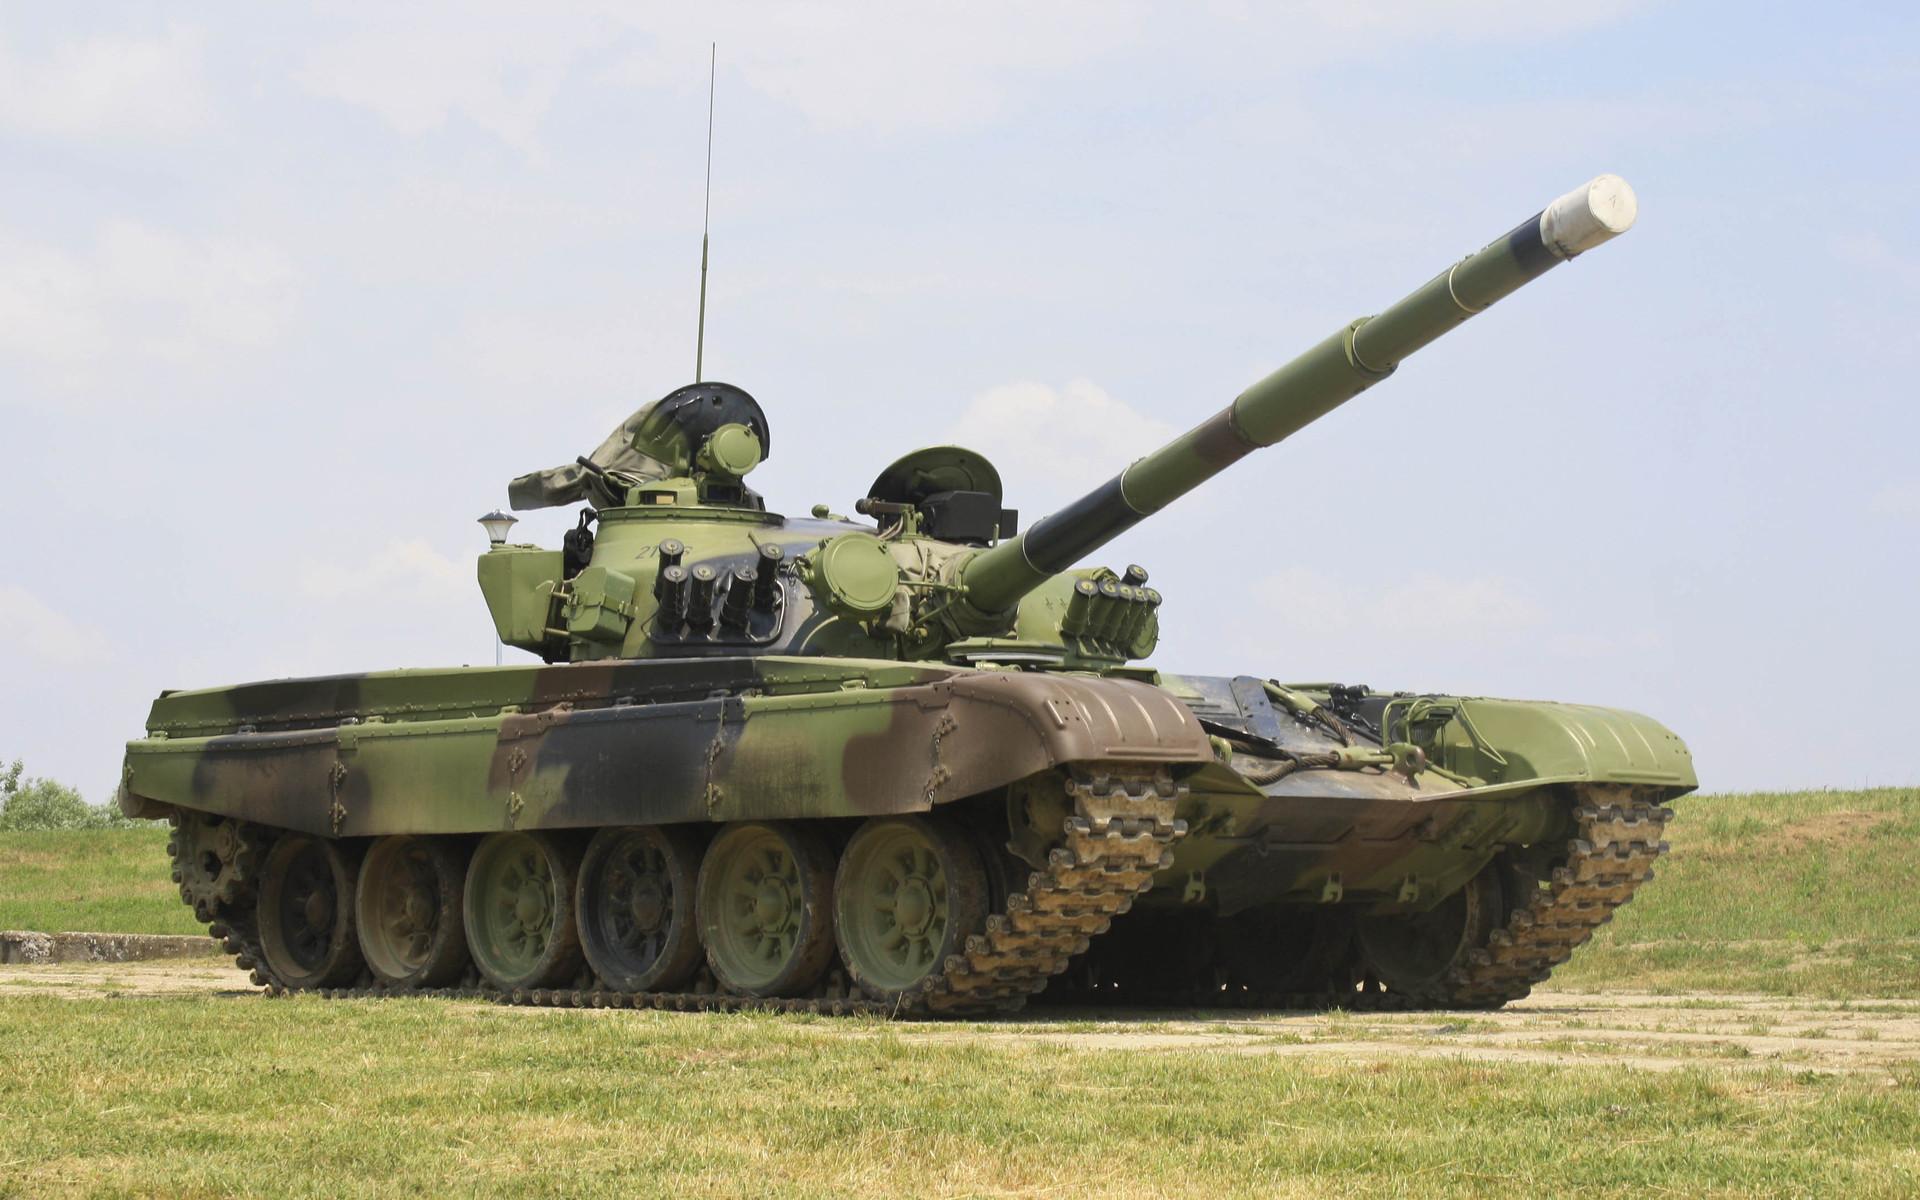 Tank HD Wallpaper | Background Image | 1920x1200 | ID ...